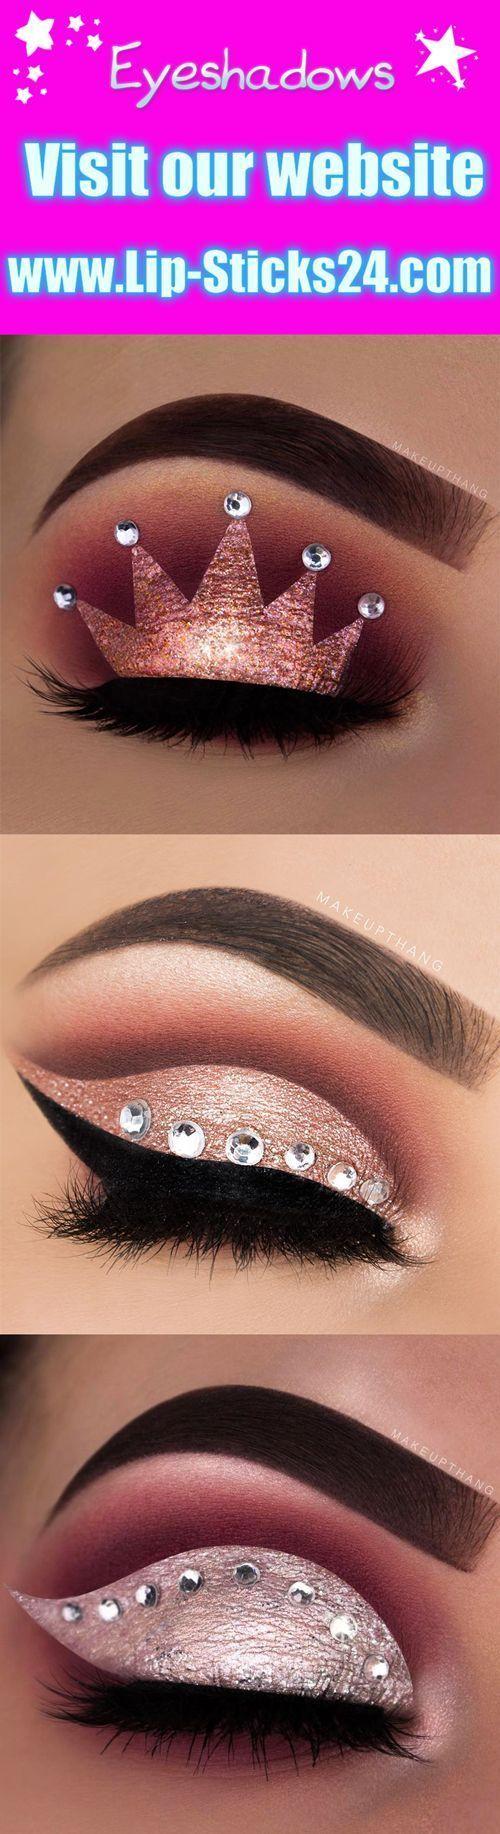 Sombra de ojos de maquillaje, base de maquillaje paso a paso, tutorial de maquillaje …